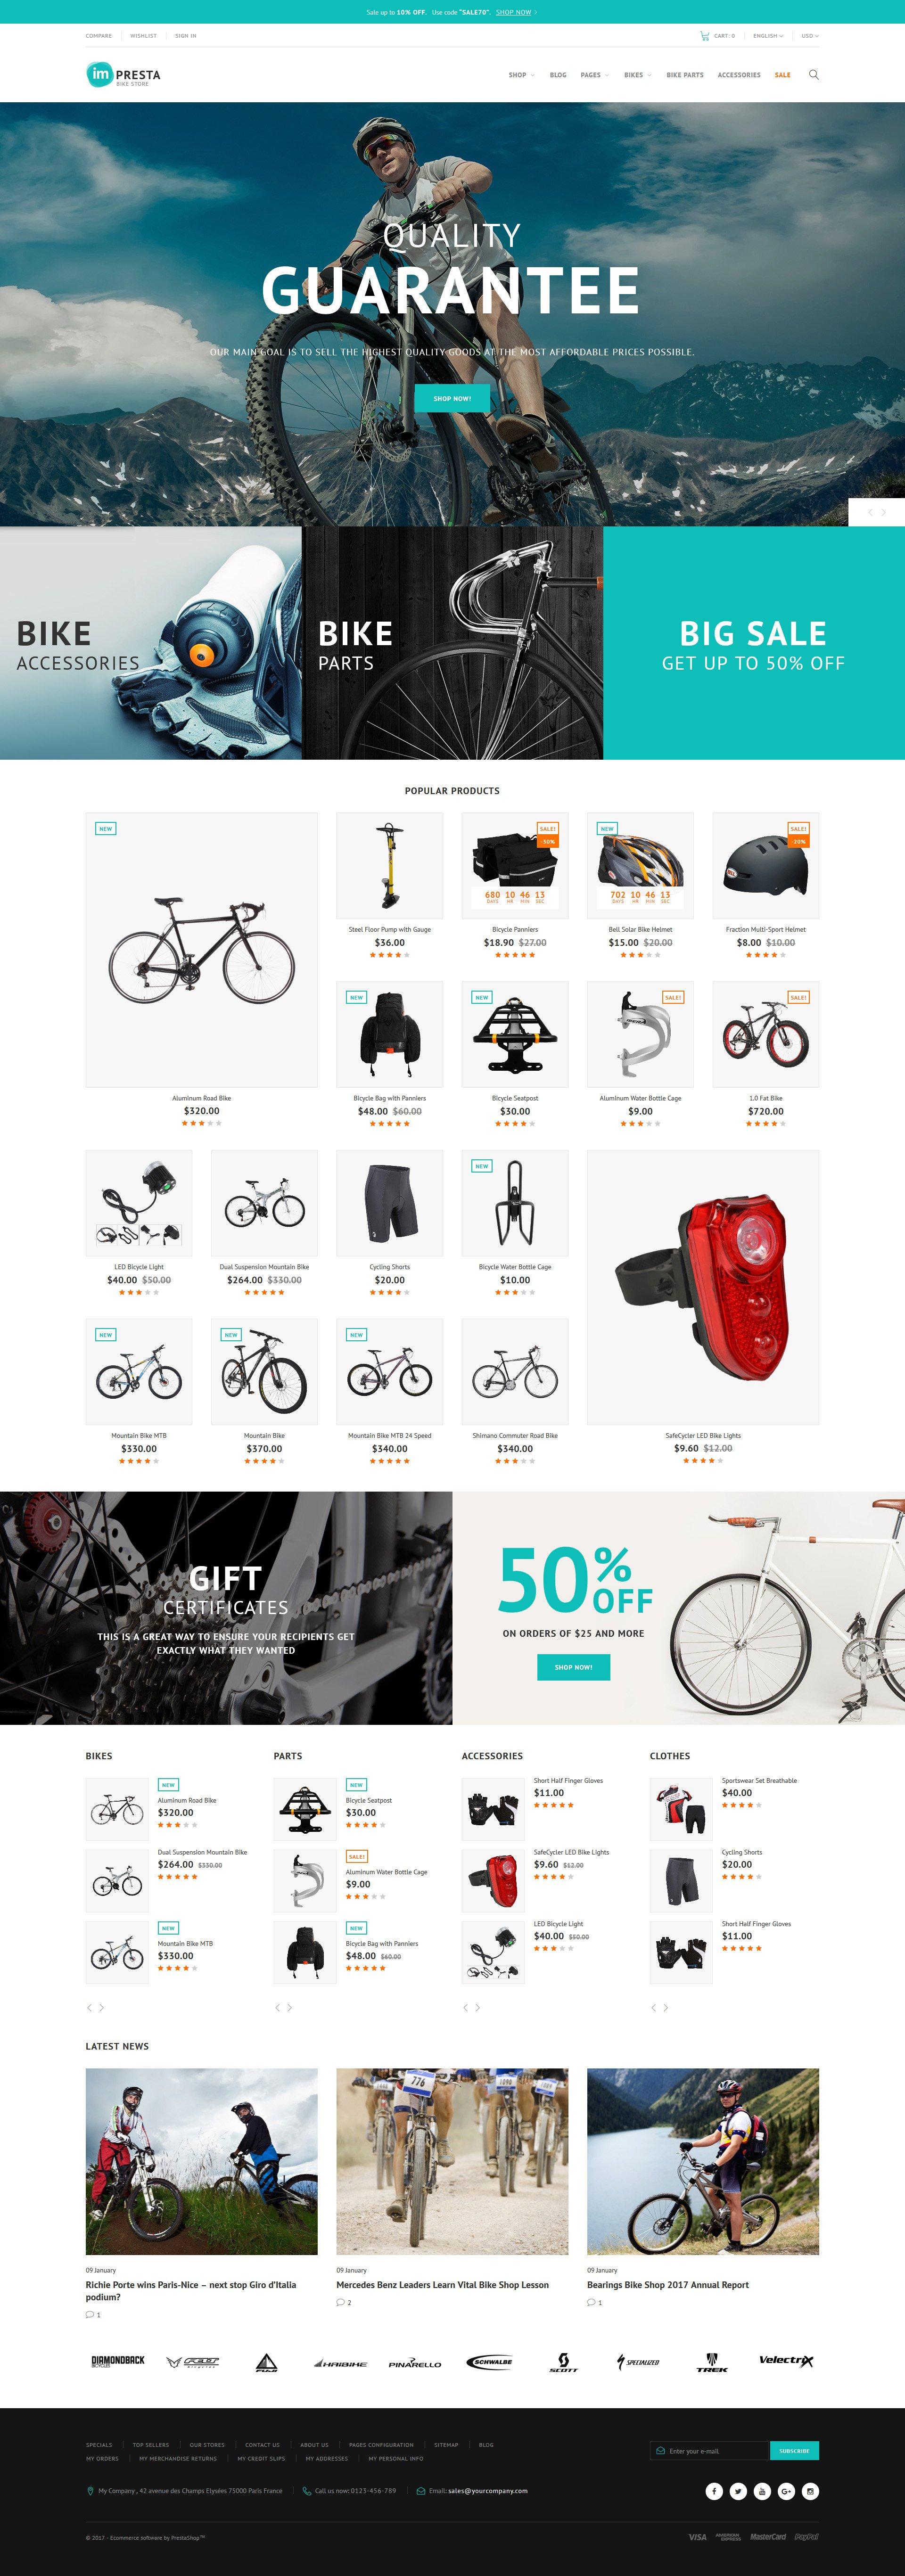 Responsivt Impresta - Bike Store PrestaShop-tema #64382 - skärmbild